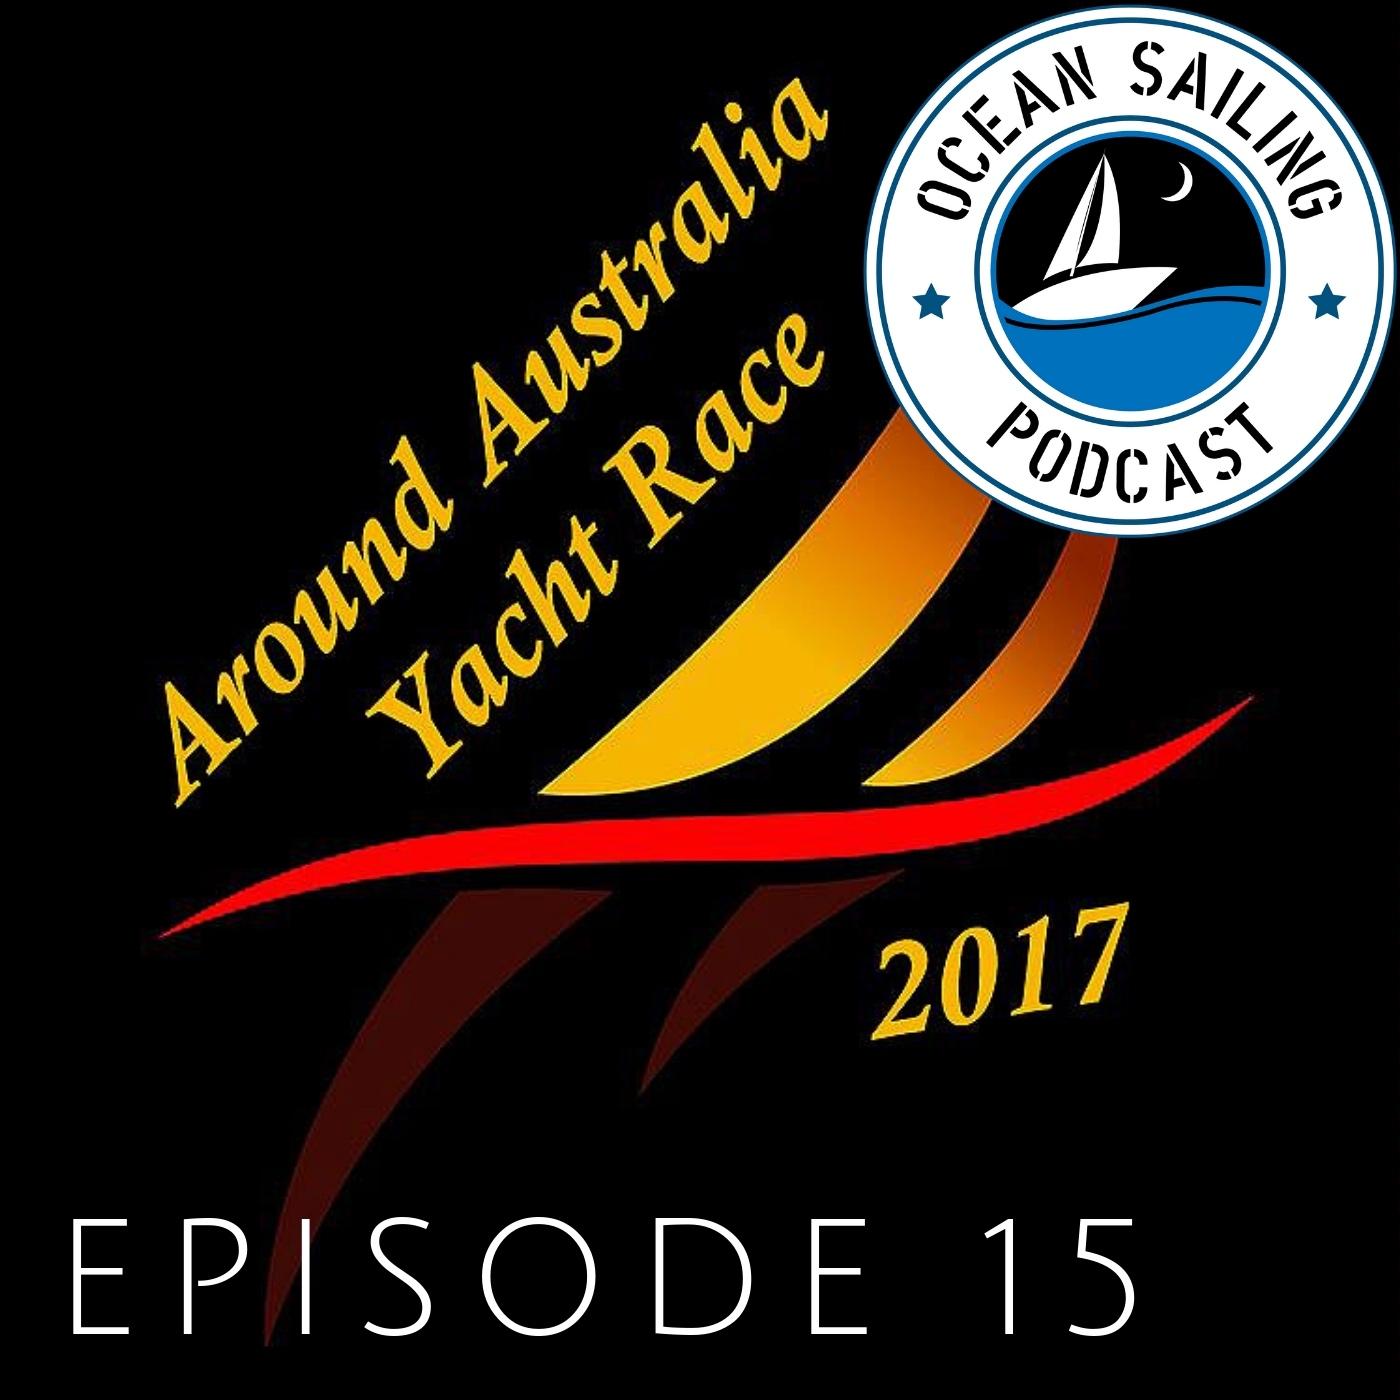 Ian Thomson Australian Circumnavigation Record